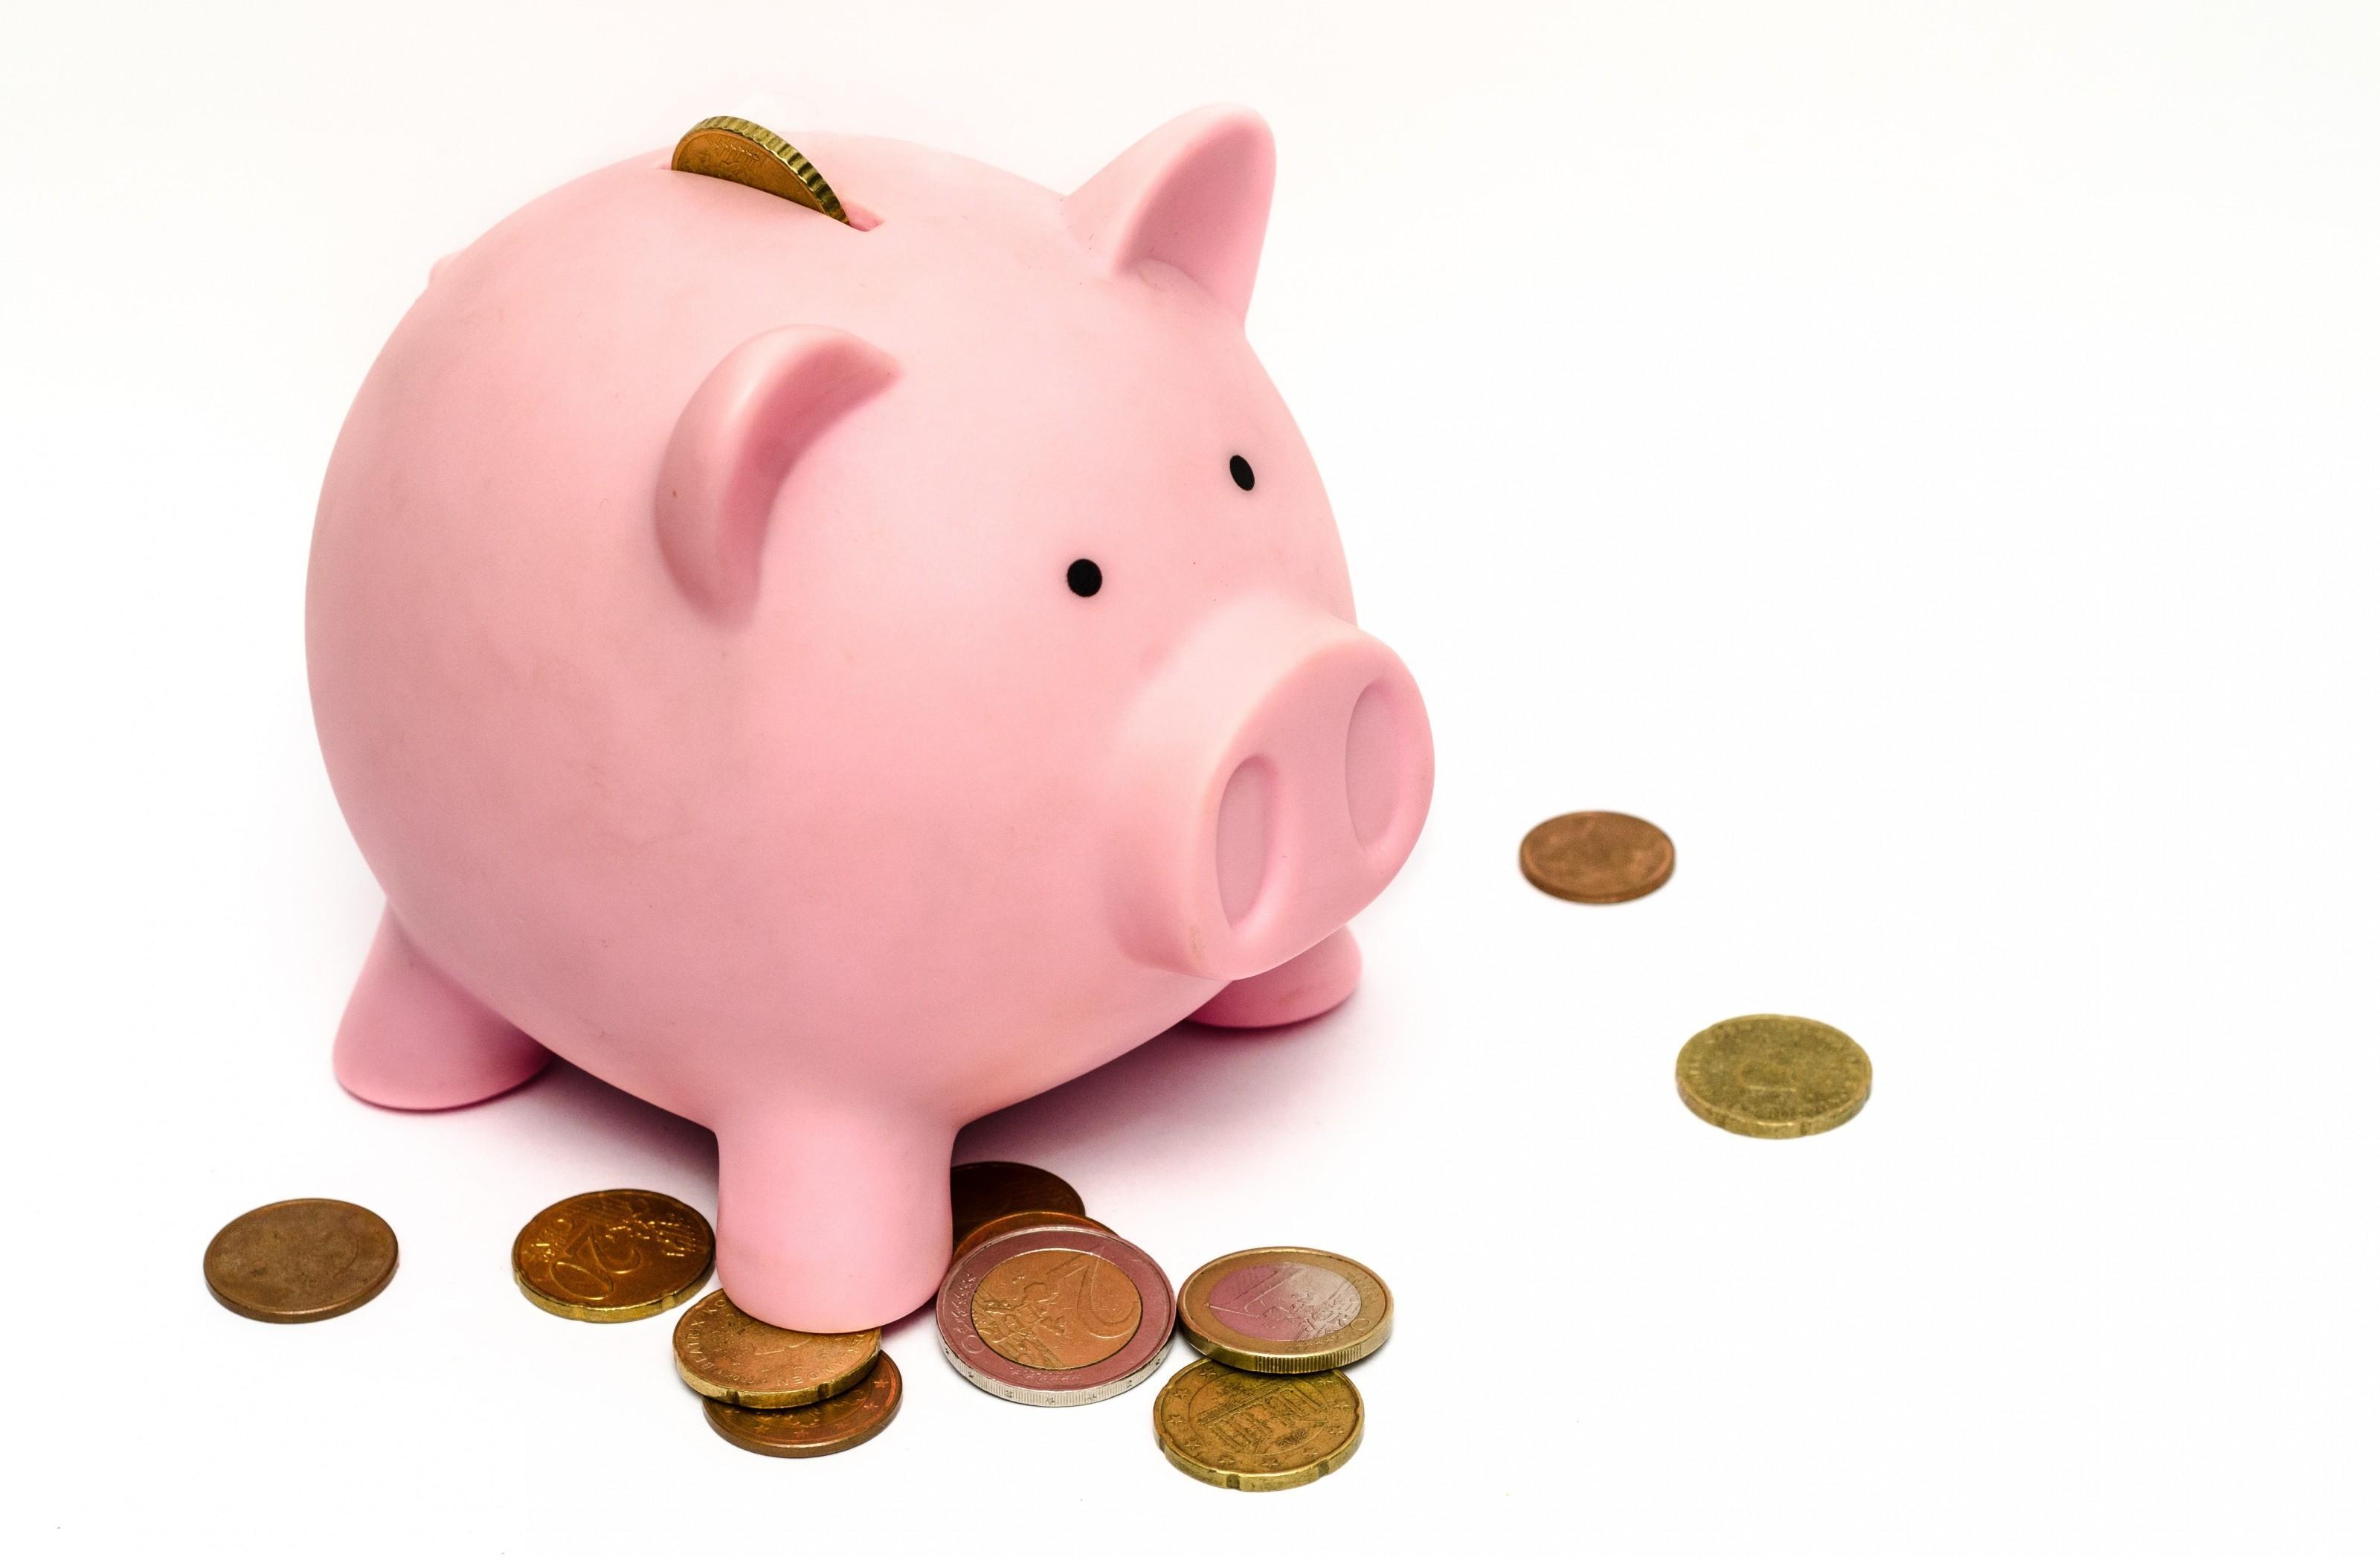 piggy-bank-money-savings-financial-economy-success | JP & Brimelow